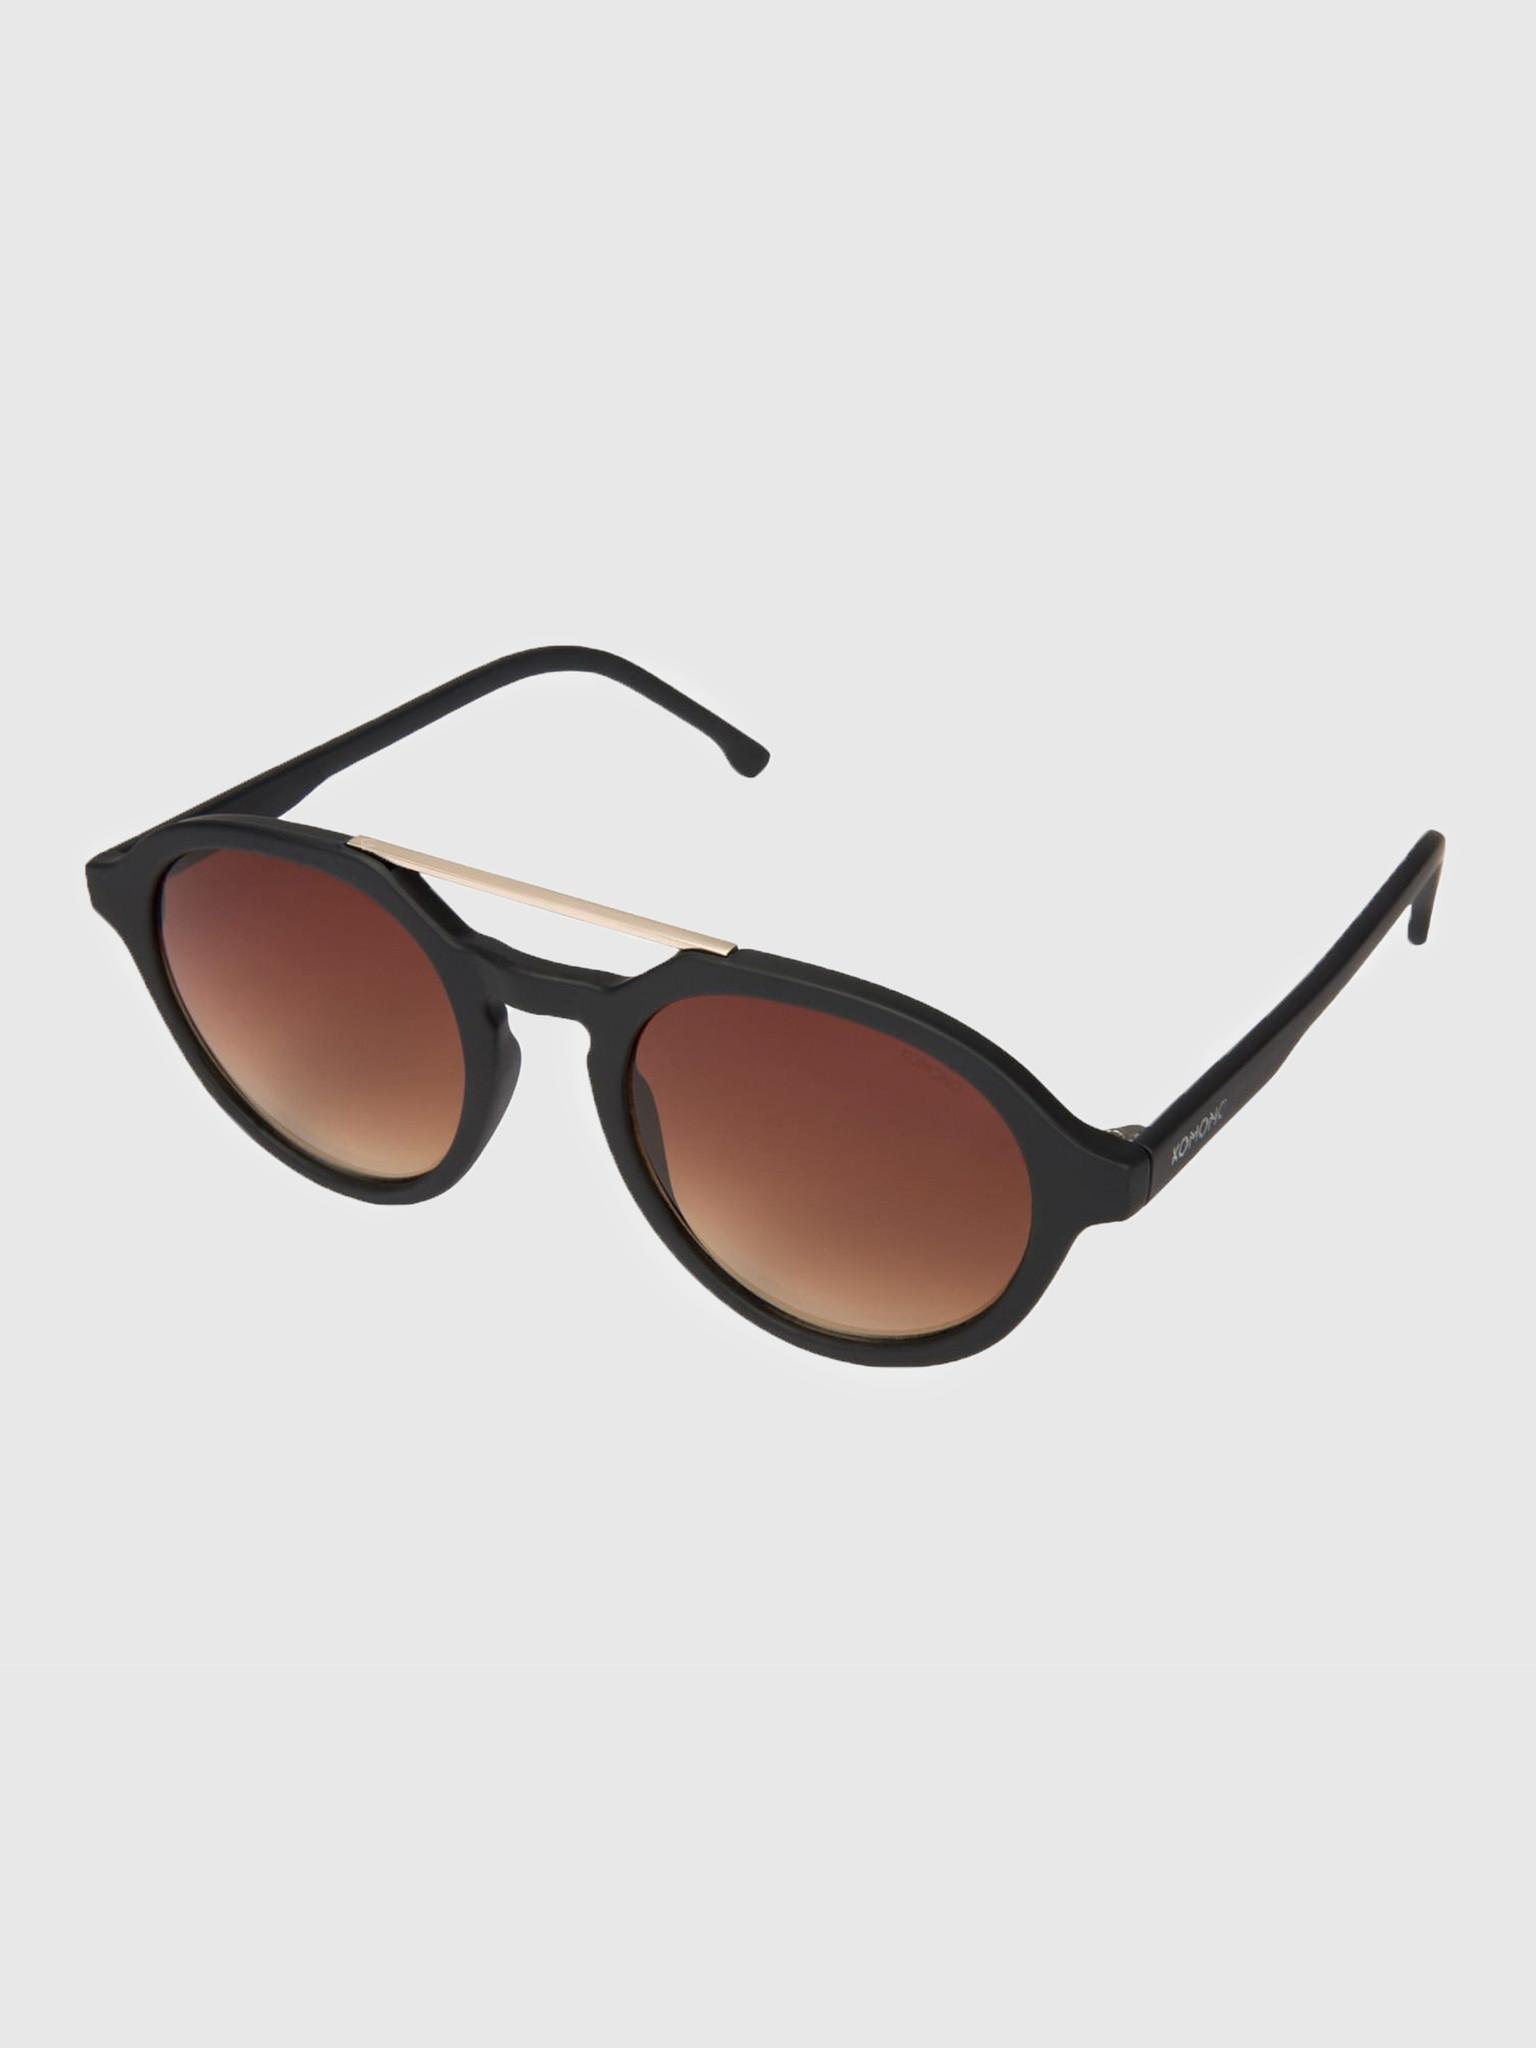 Komono Komono Harper Sunglasses Black Rubber Kom-S3153